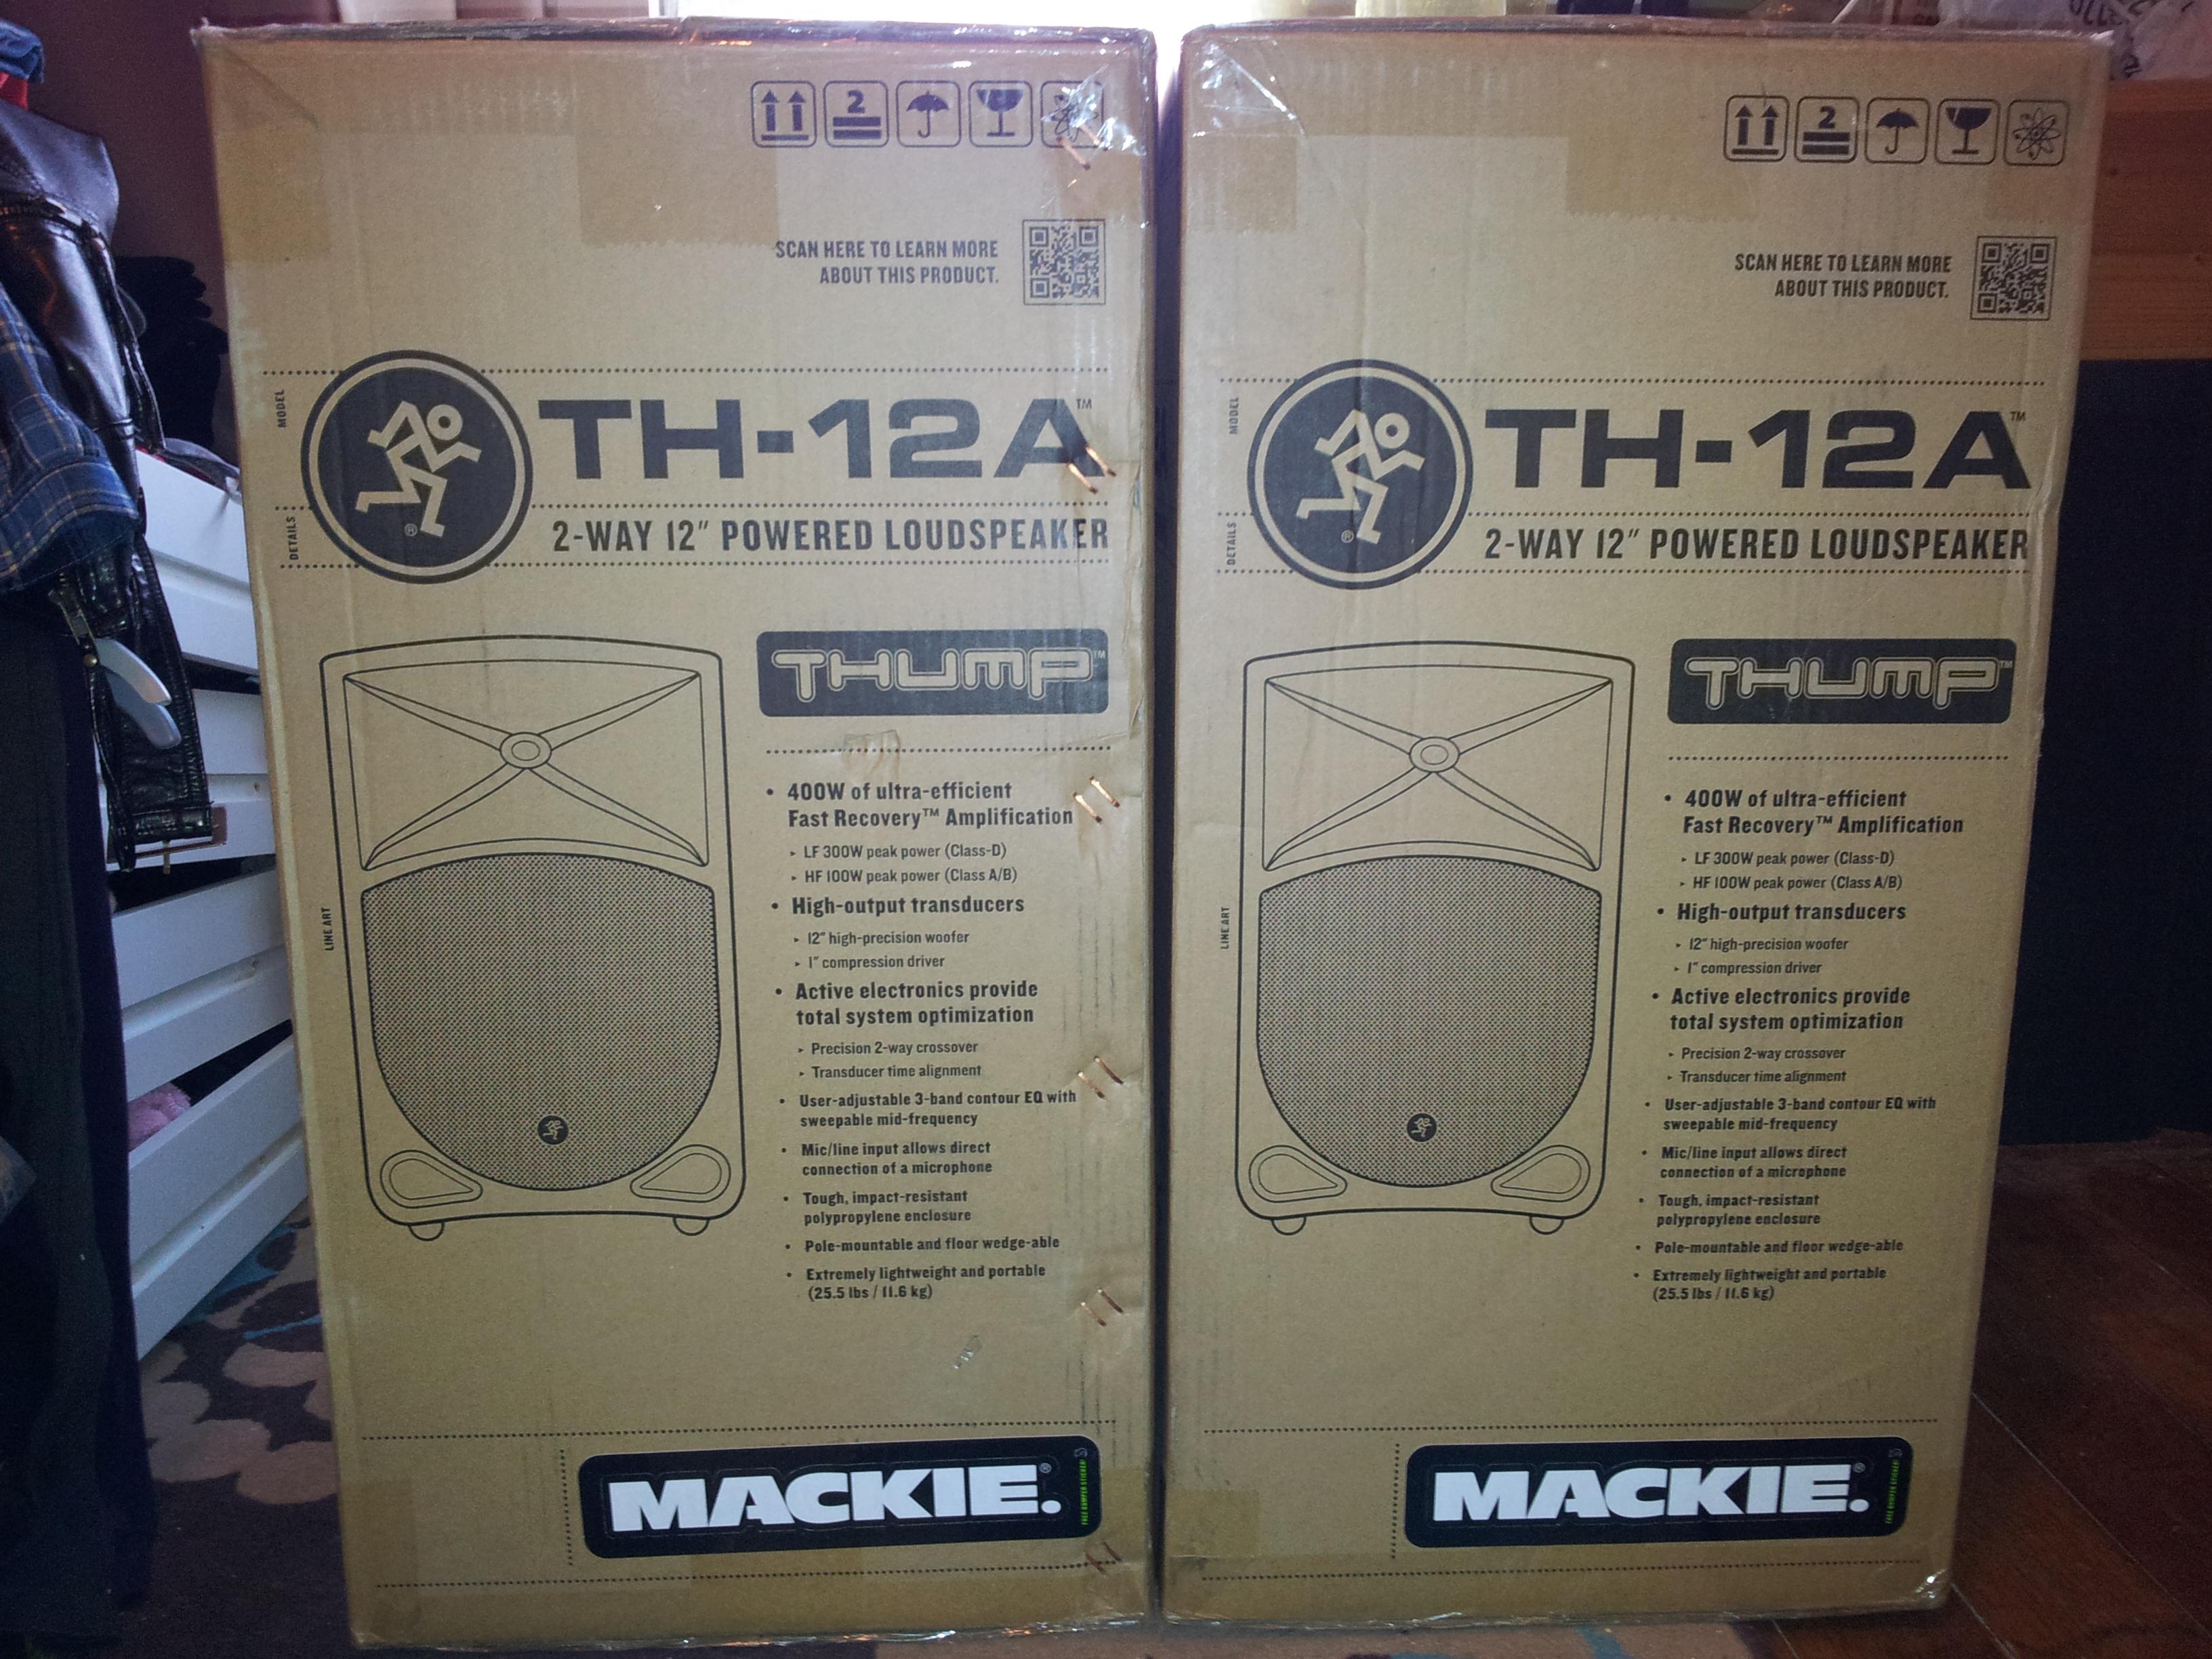 mackie th 12a image 639254 audiofanzine. Black Bedroom Furniture Sets. Home Design Ideas